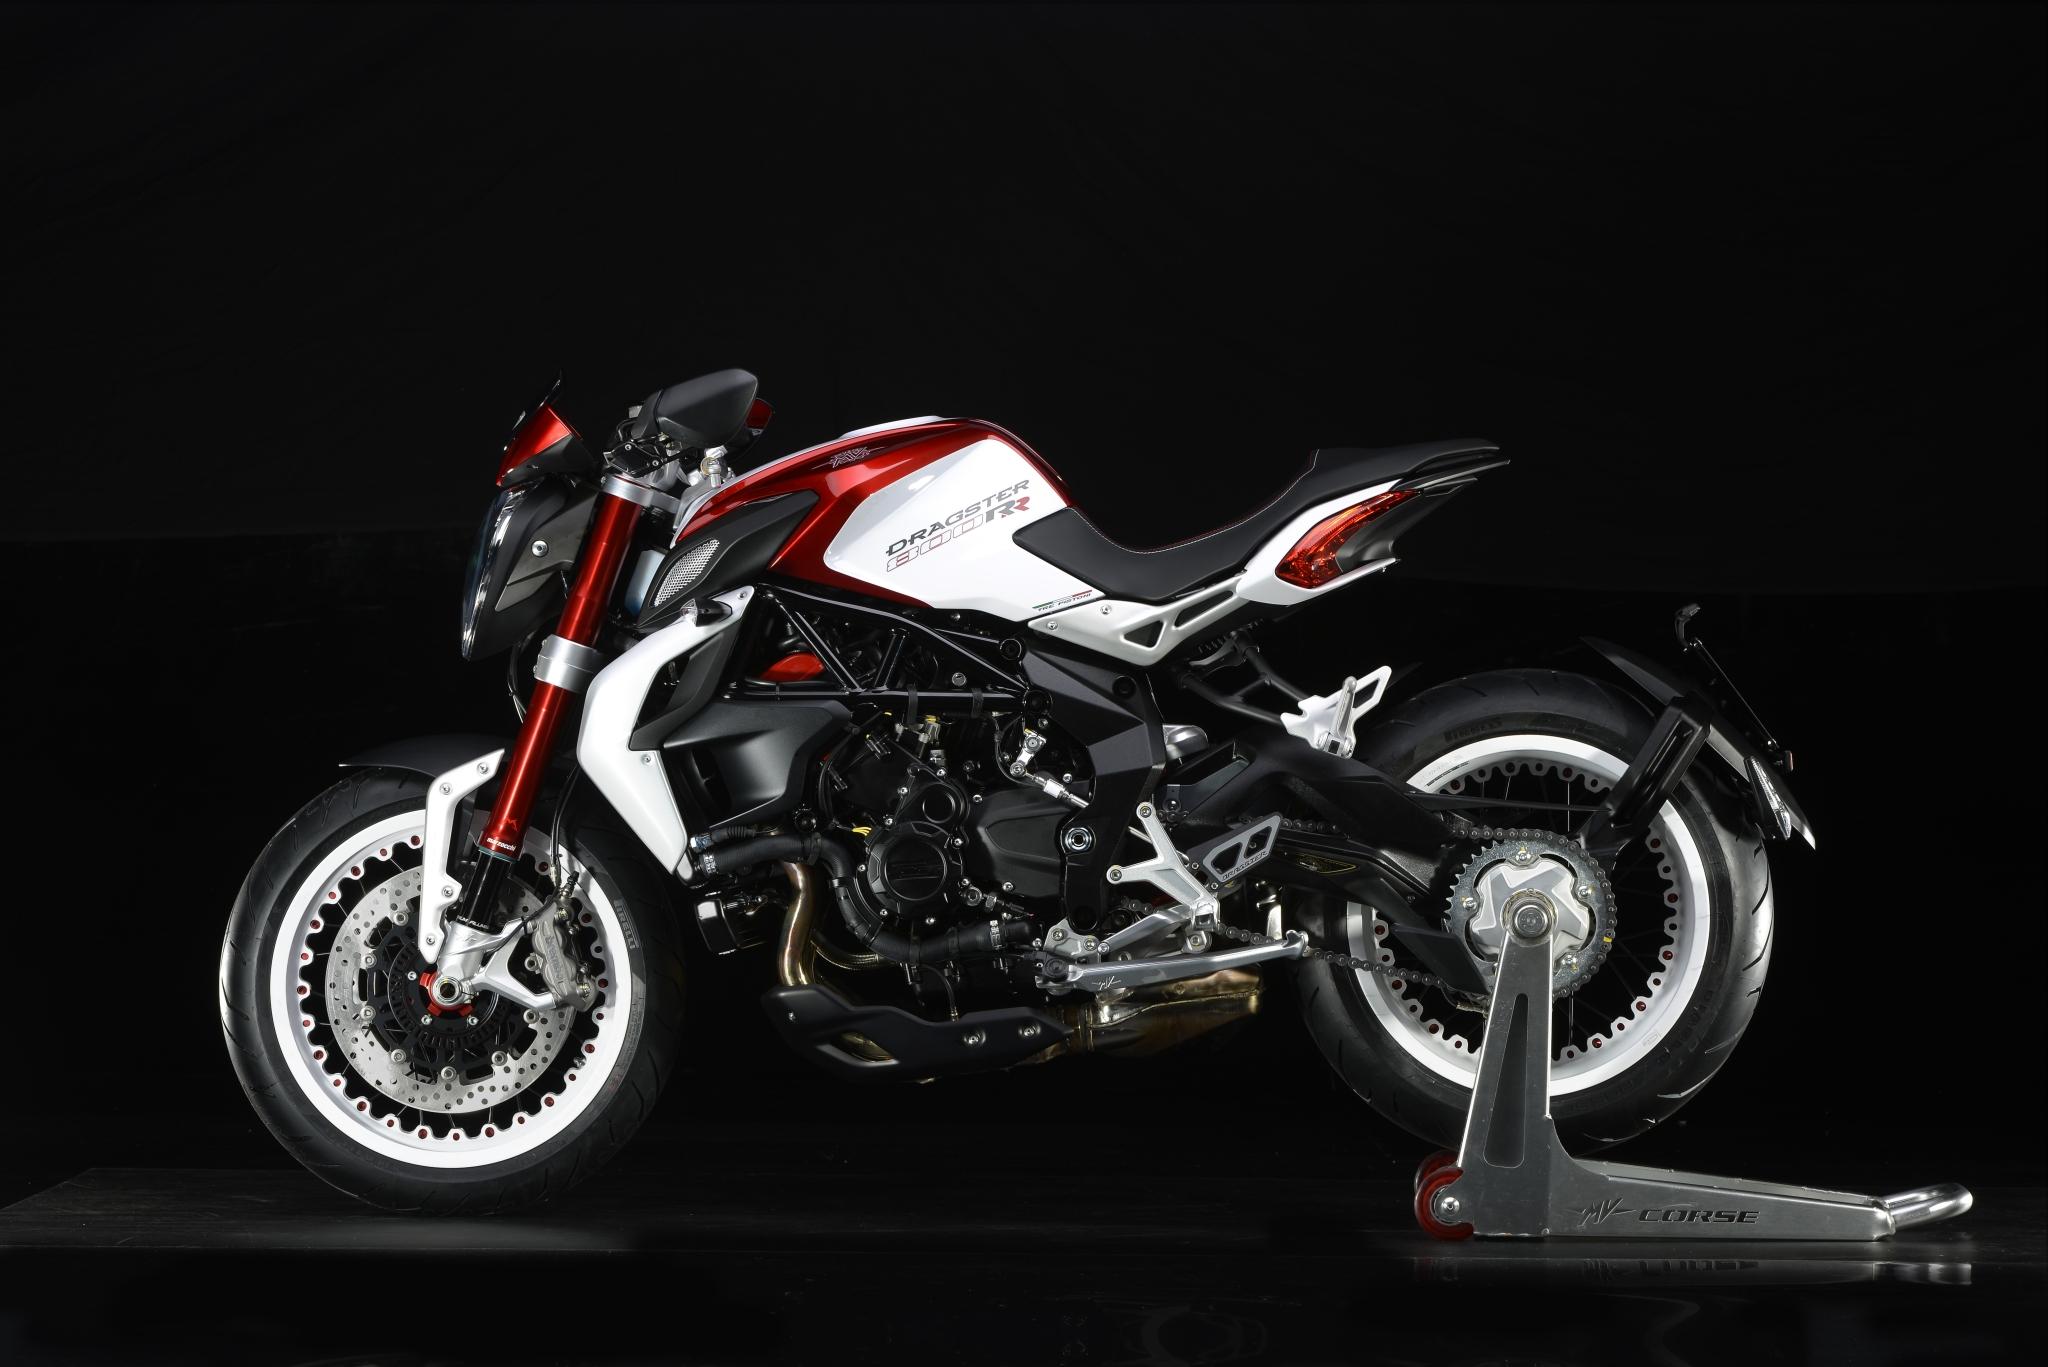 Brutale 800 MV Agusta 2017 Naked Sports Bike - Review